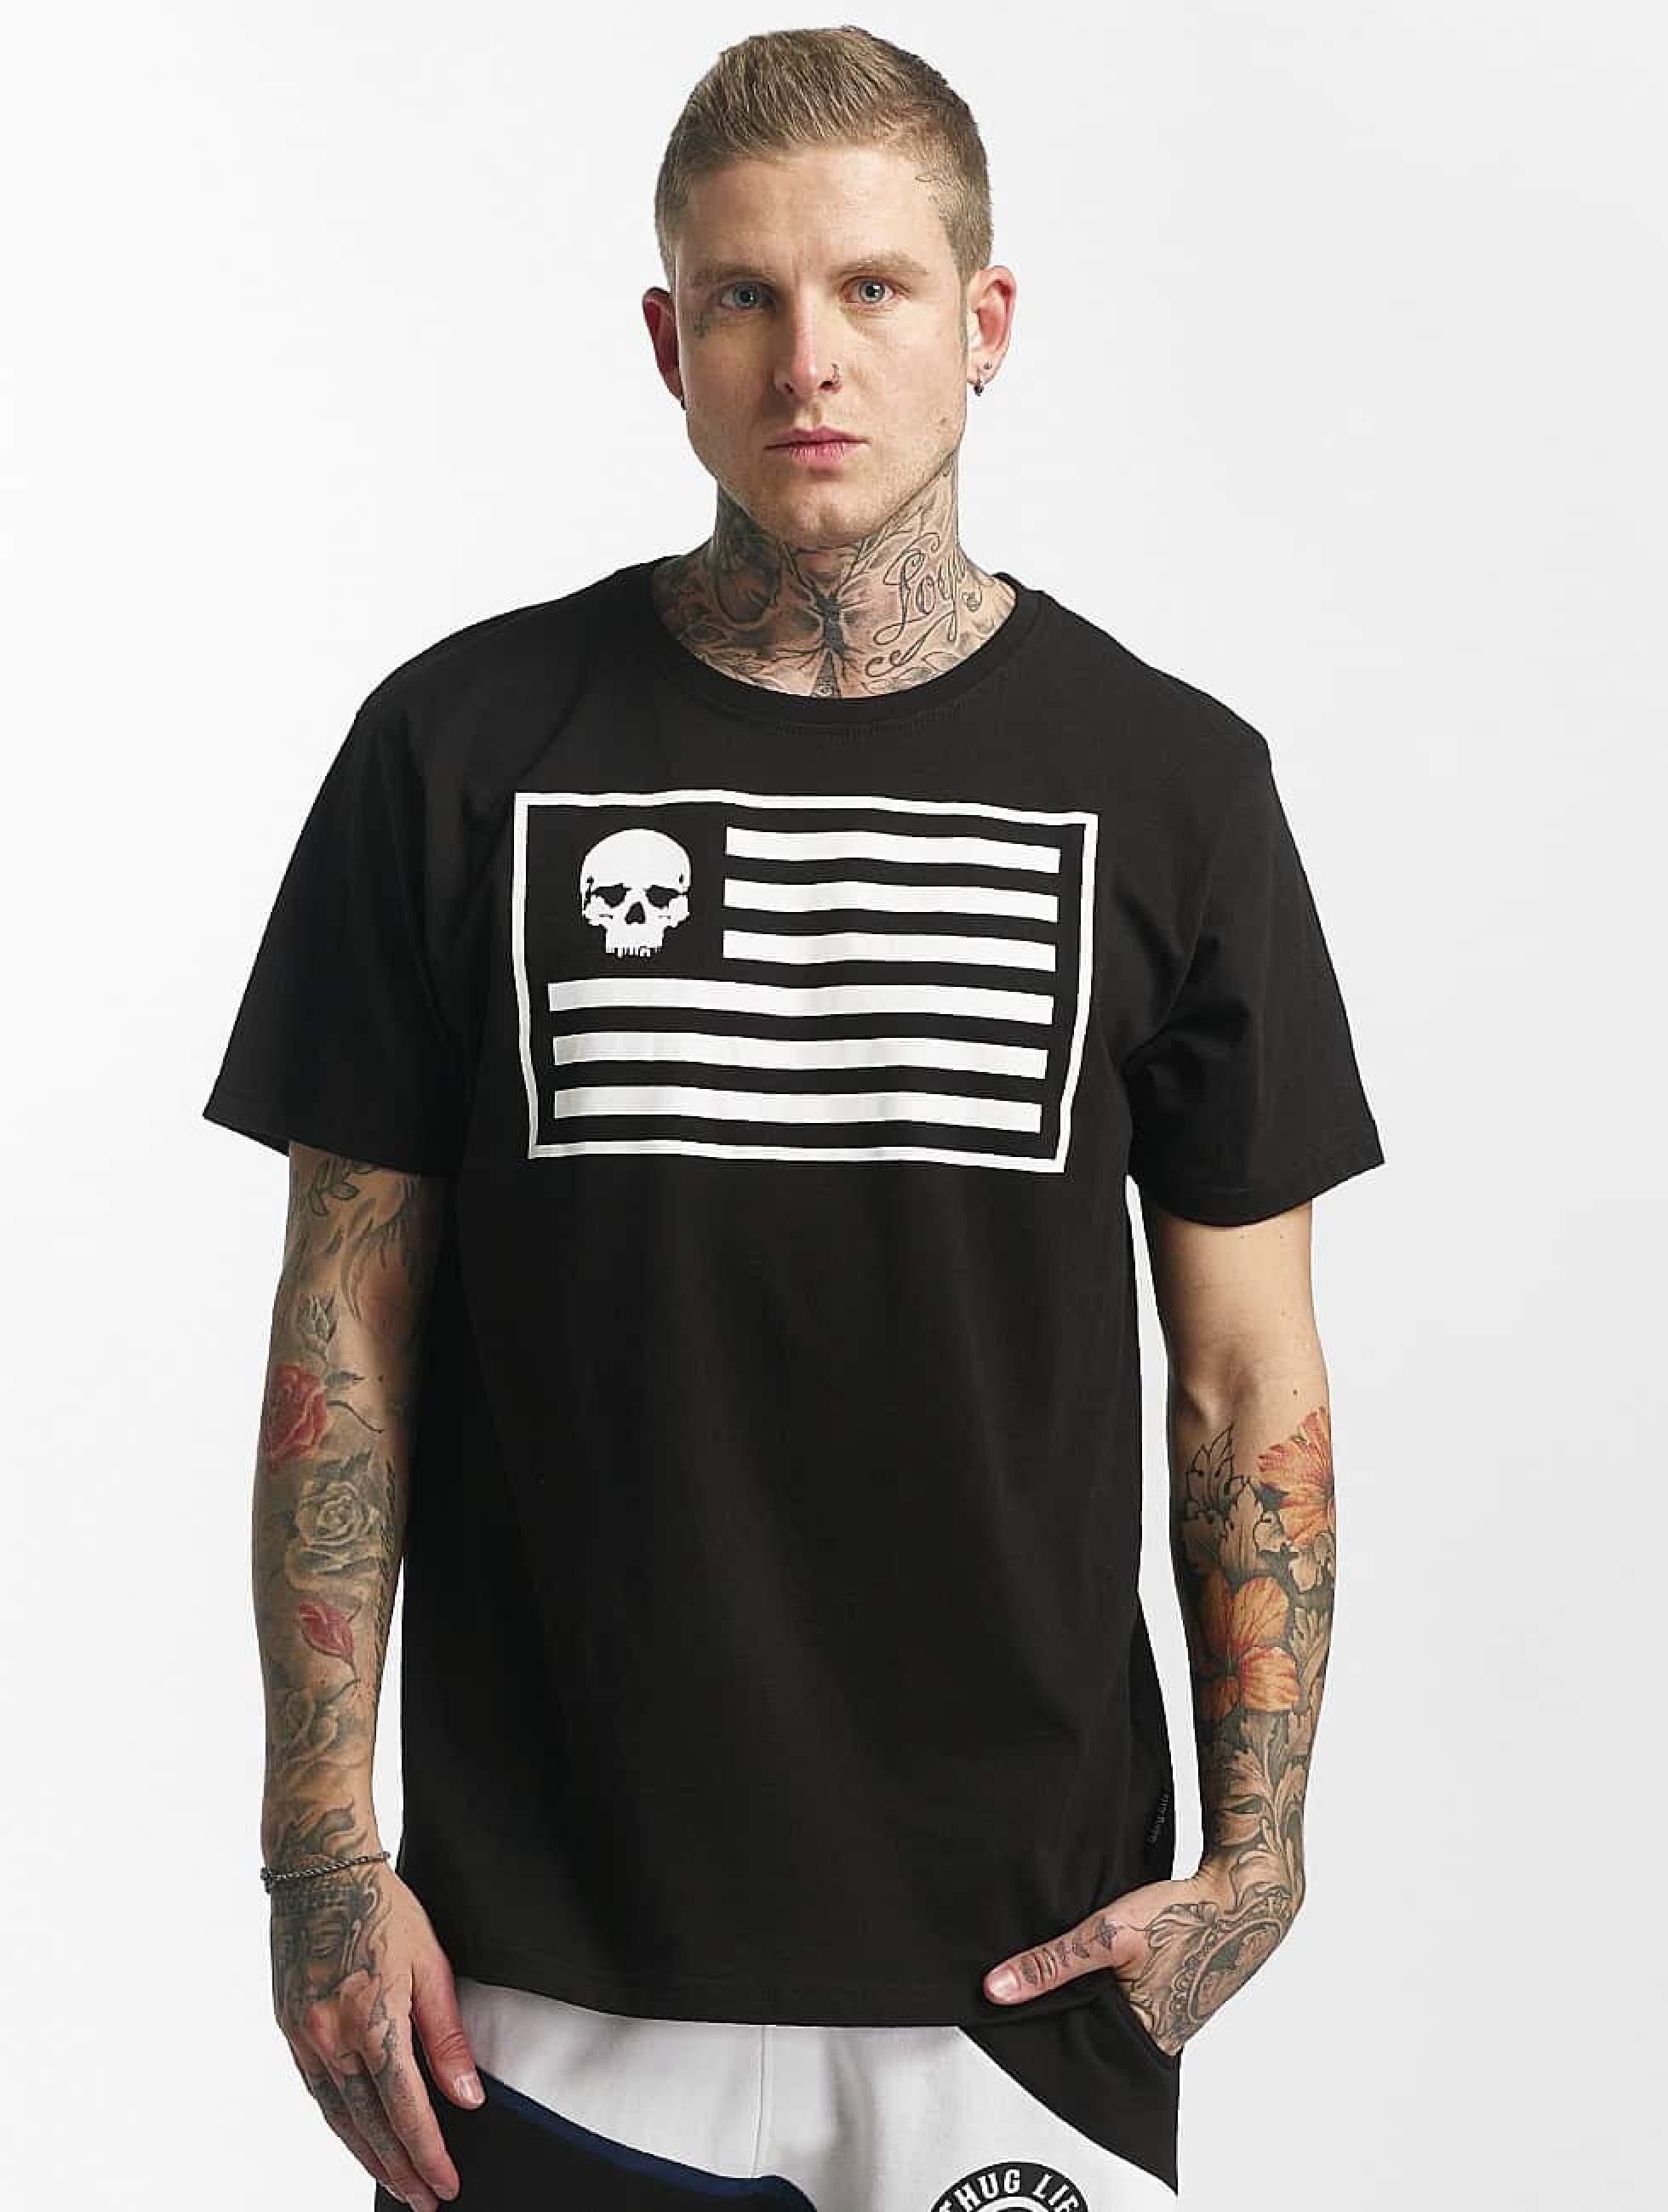 Thug Life / T-Shirt Flag in black S